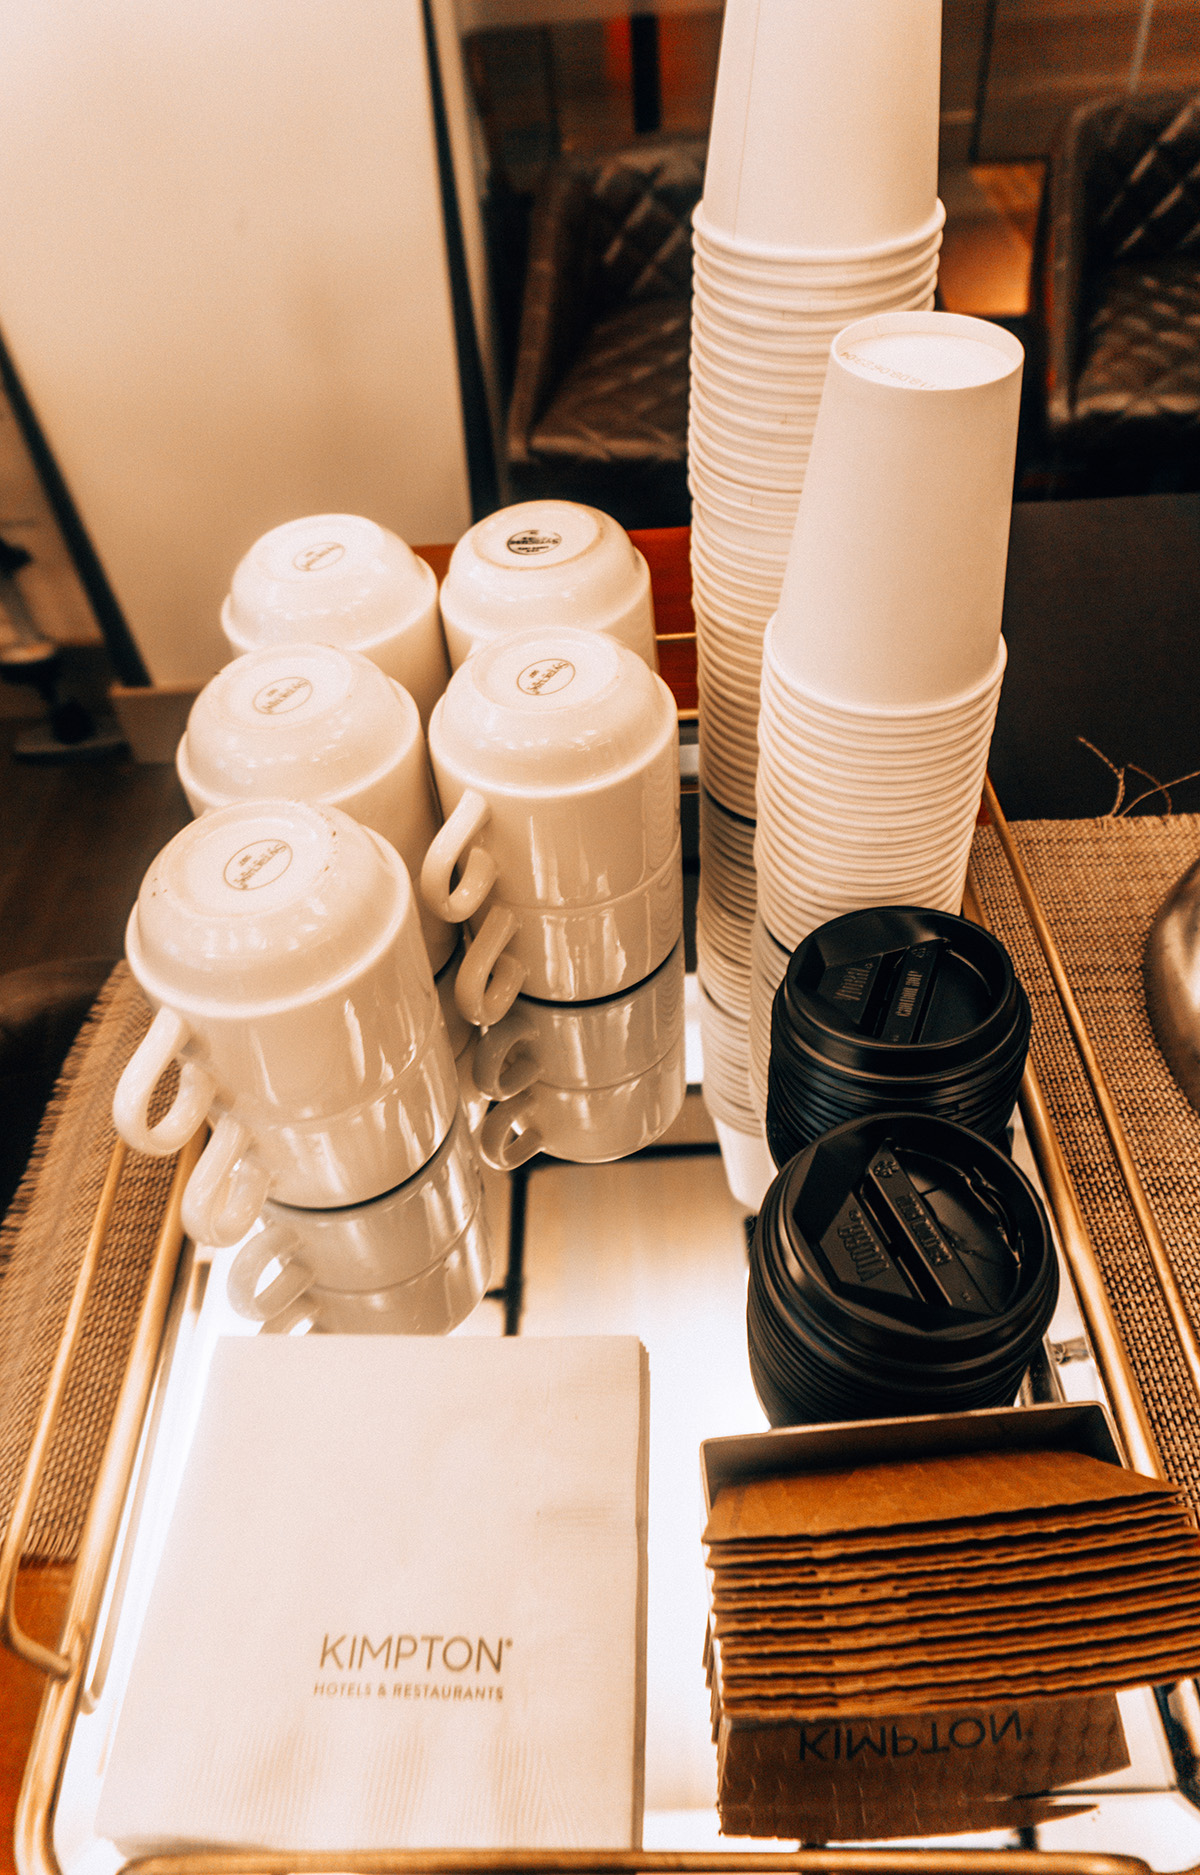 Hotel Vintage coffee bar cups